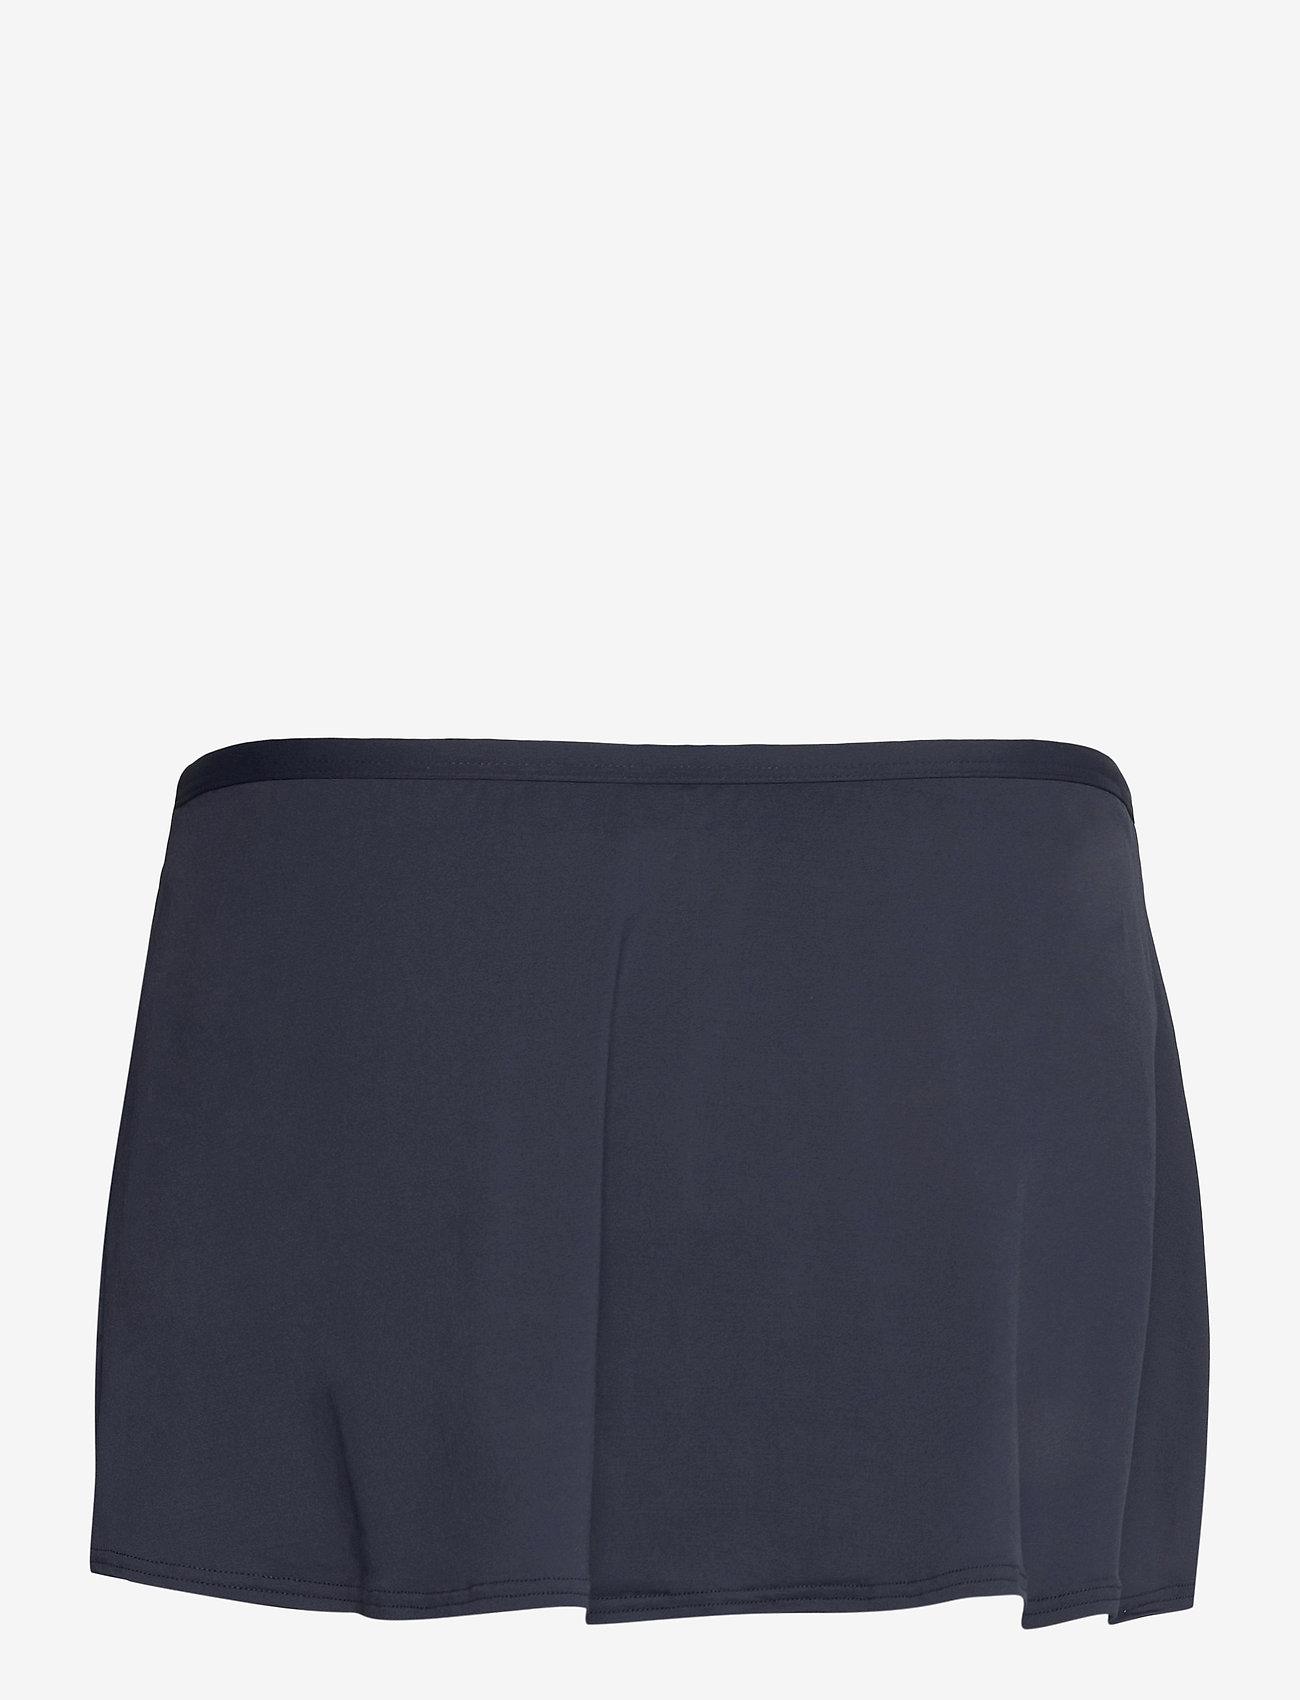 Michael Kors Swimwear - SKIRT BTM - bikinibroekjes - new navy - 1